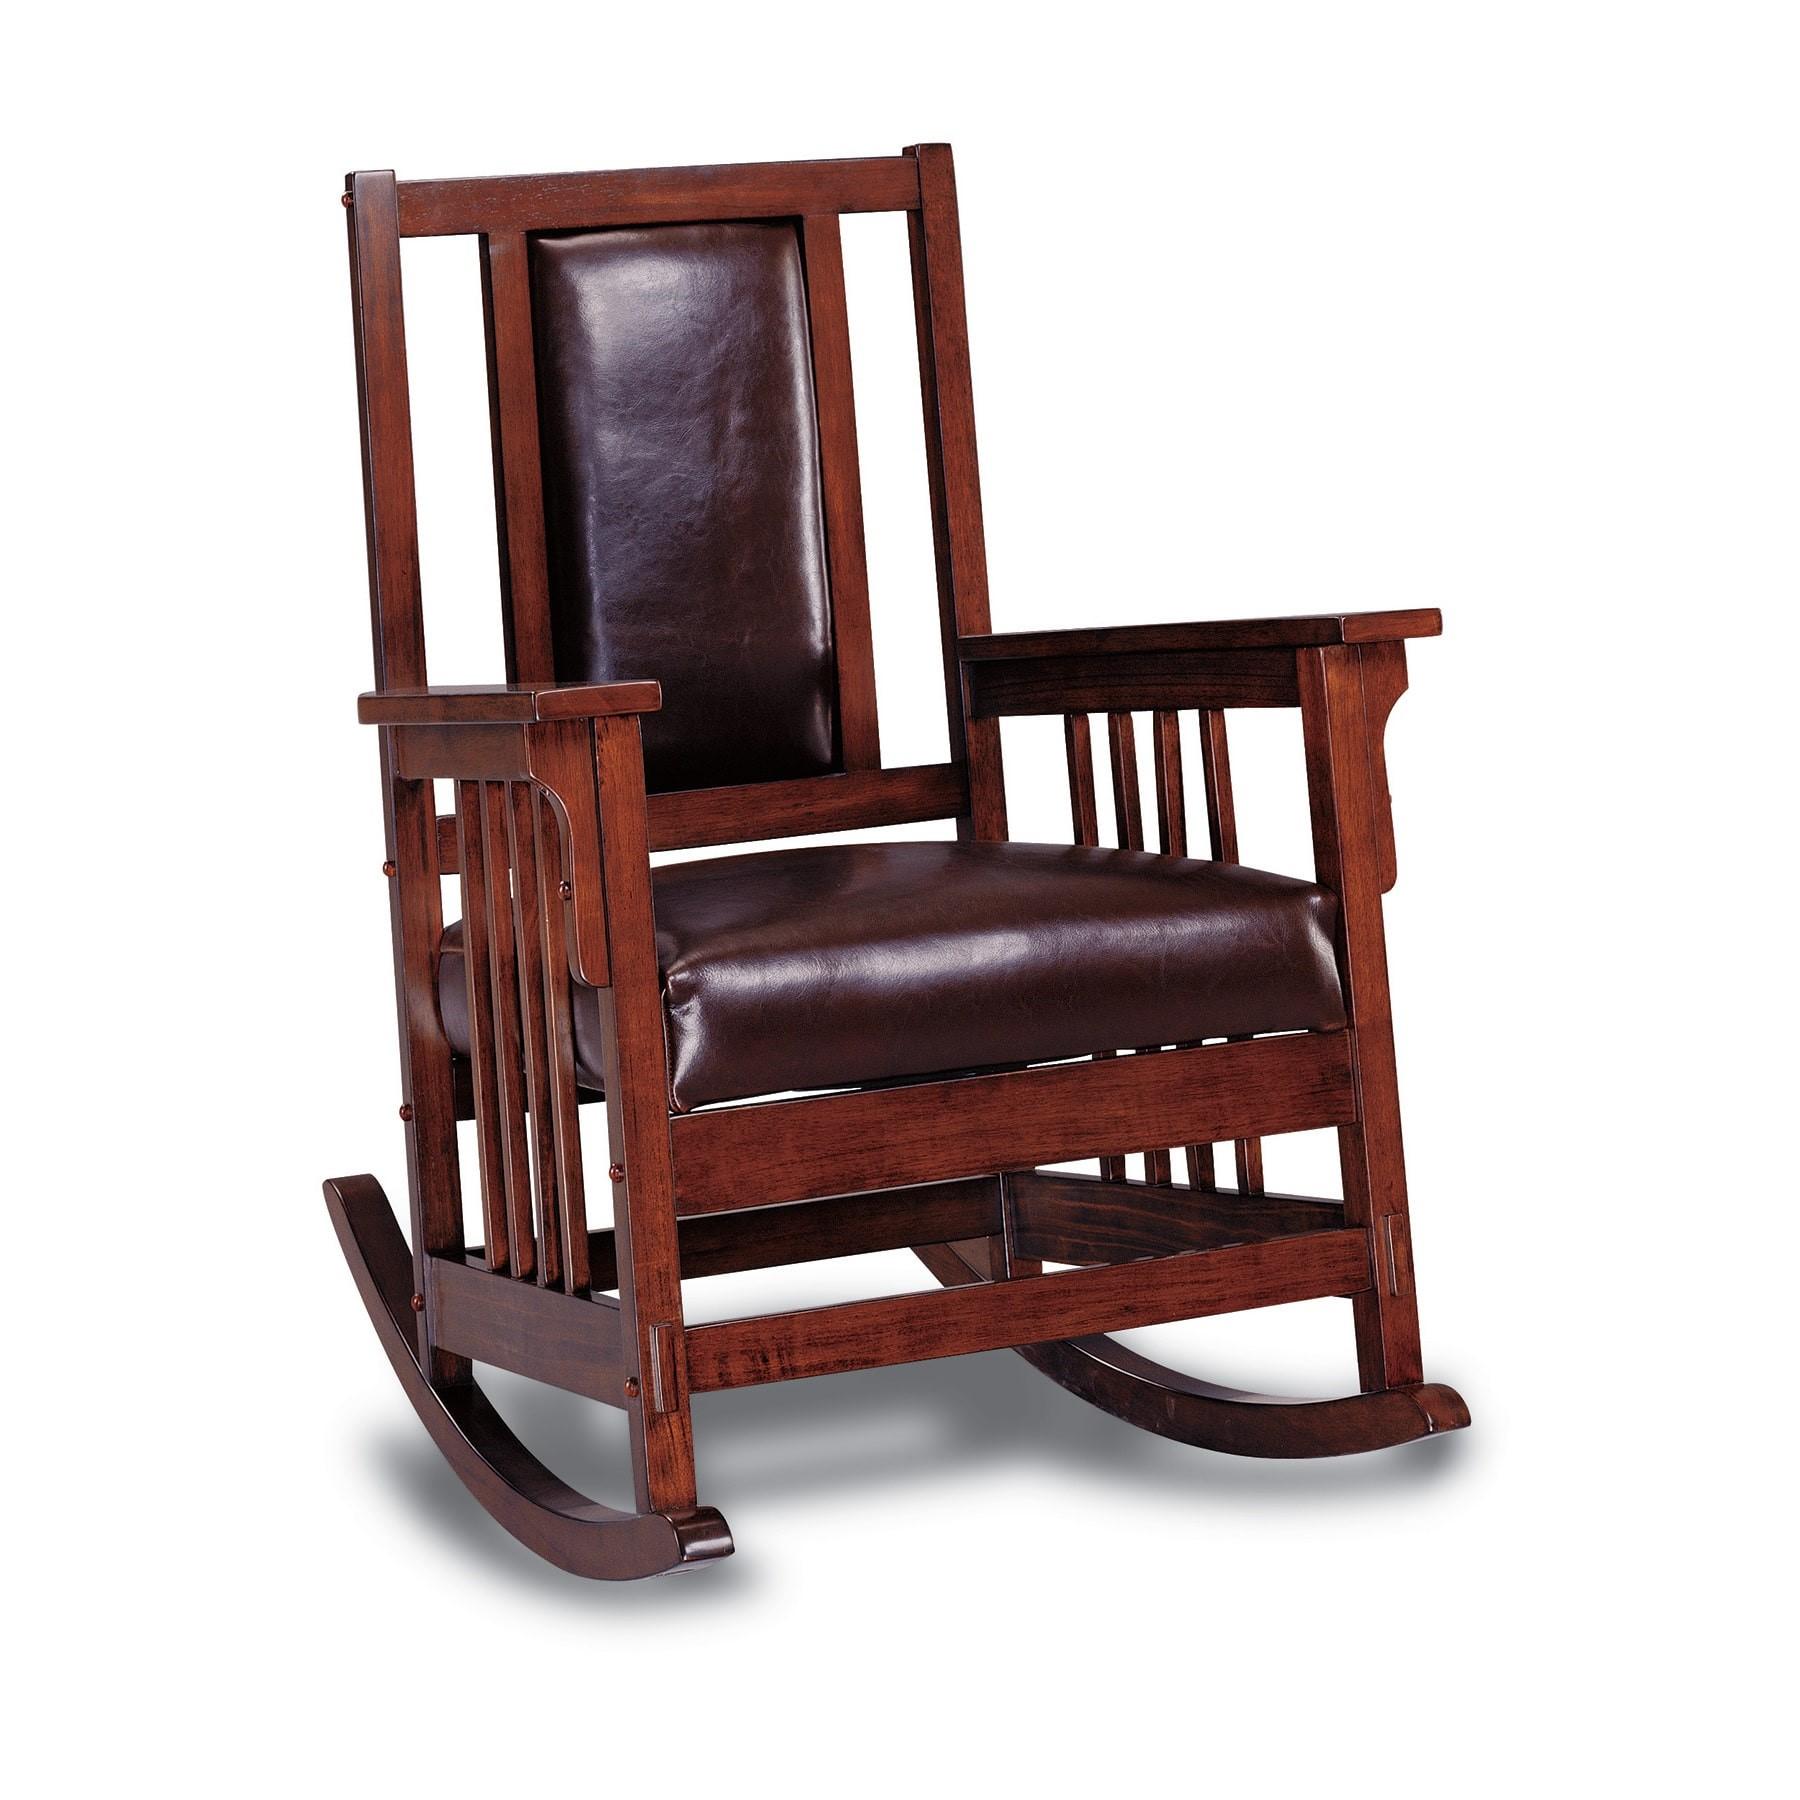 Coaster Company Indoor Rocking Chair; Tobacco Intended For Tobacco Brown Wooden Rocking Chairs (#4 of 20)